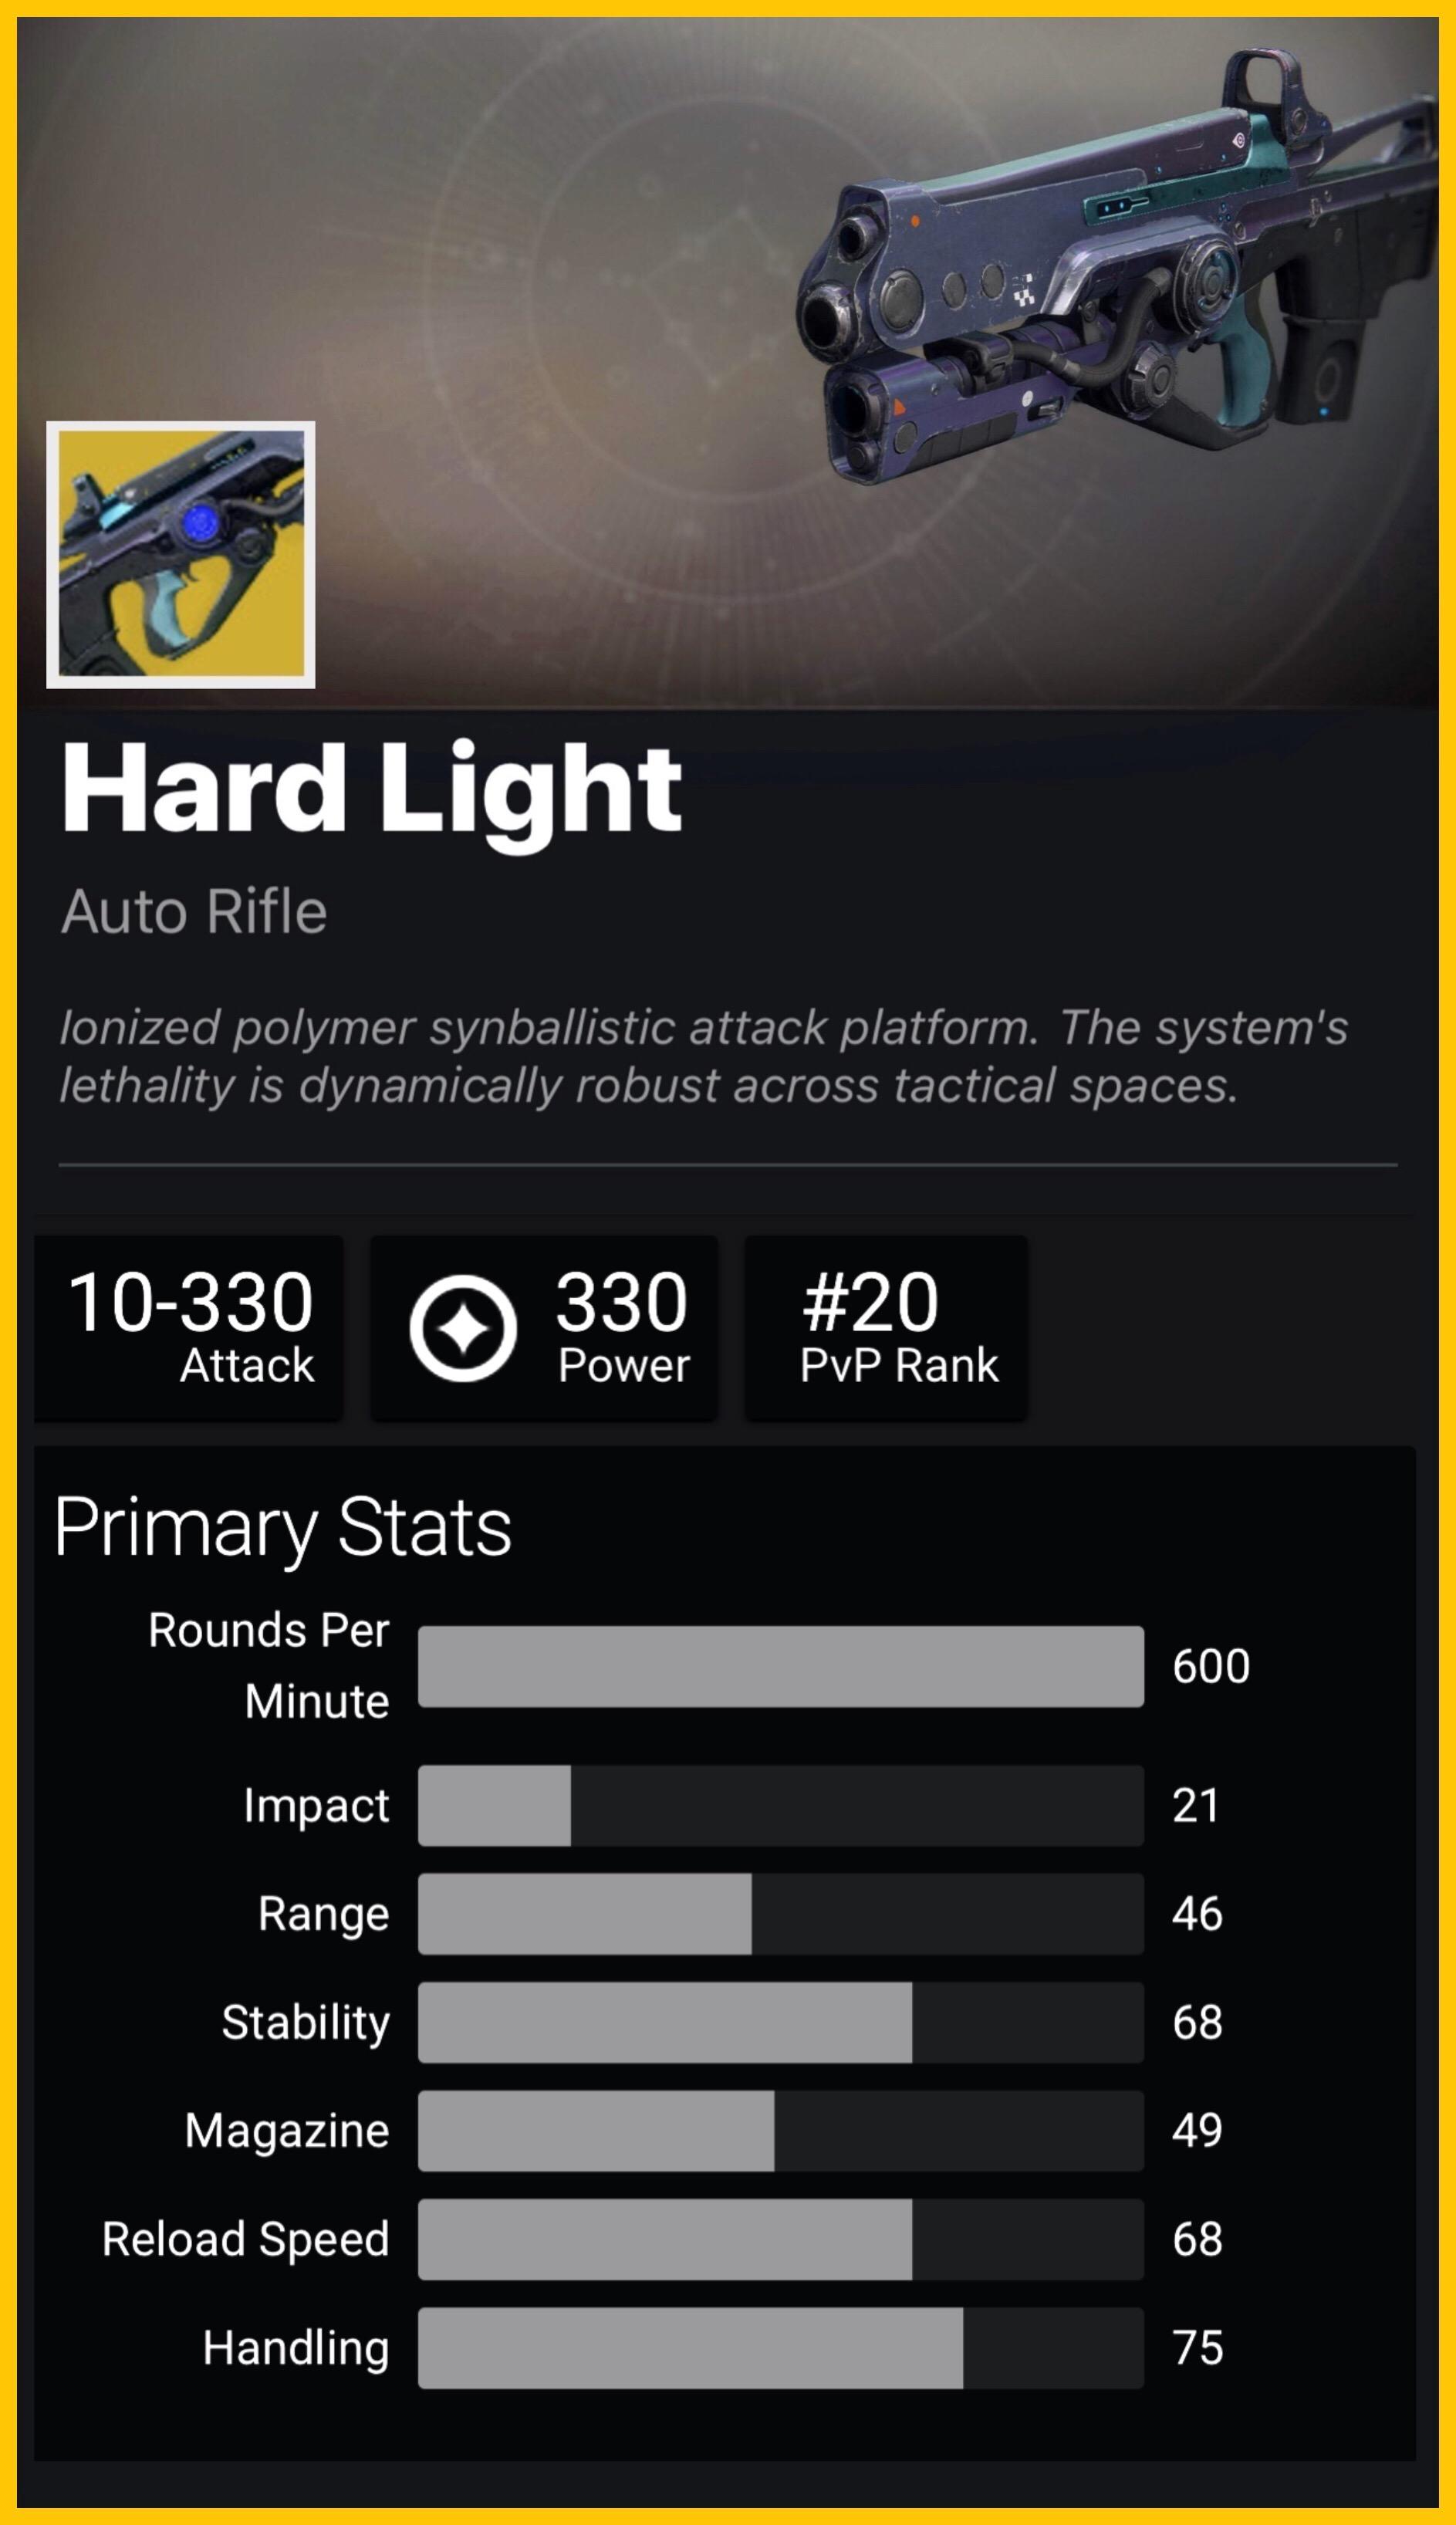 HARD LIGHT.JPEG